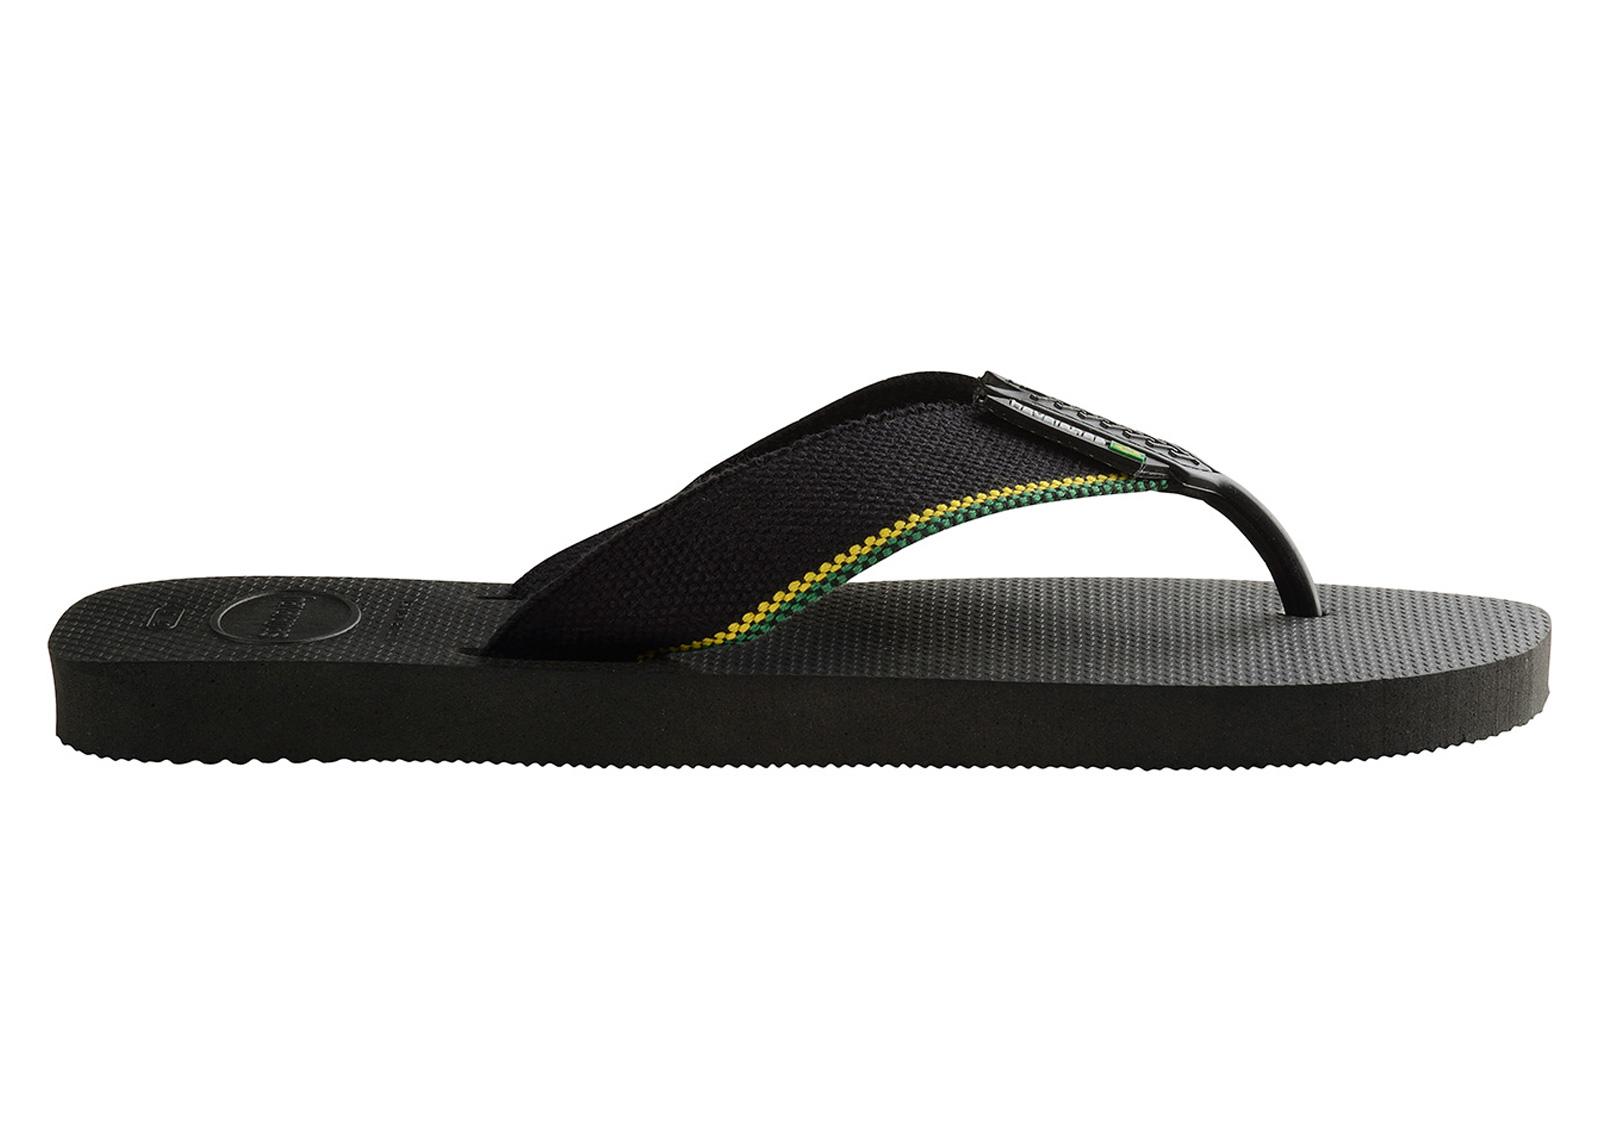 2d6468950 Flip-Flops Urban Brasil Black - Brand Havaianas